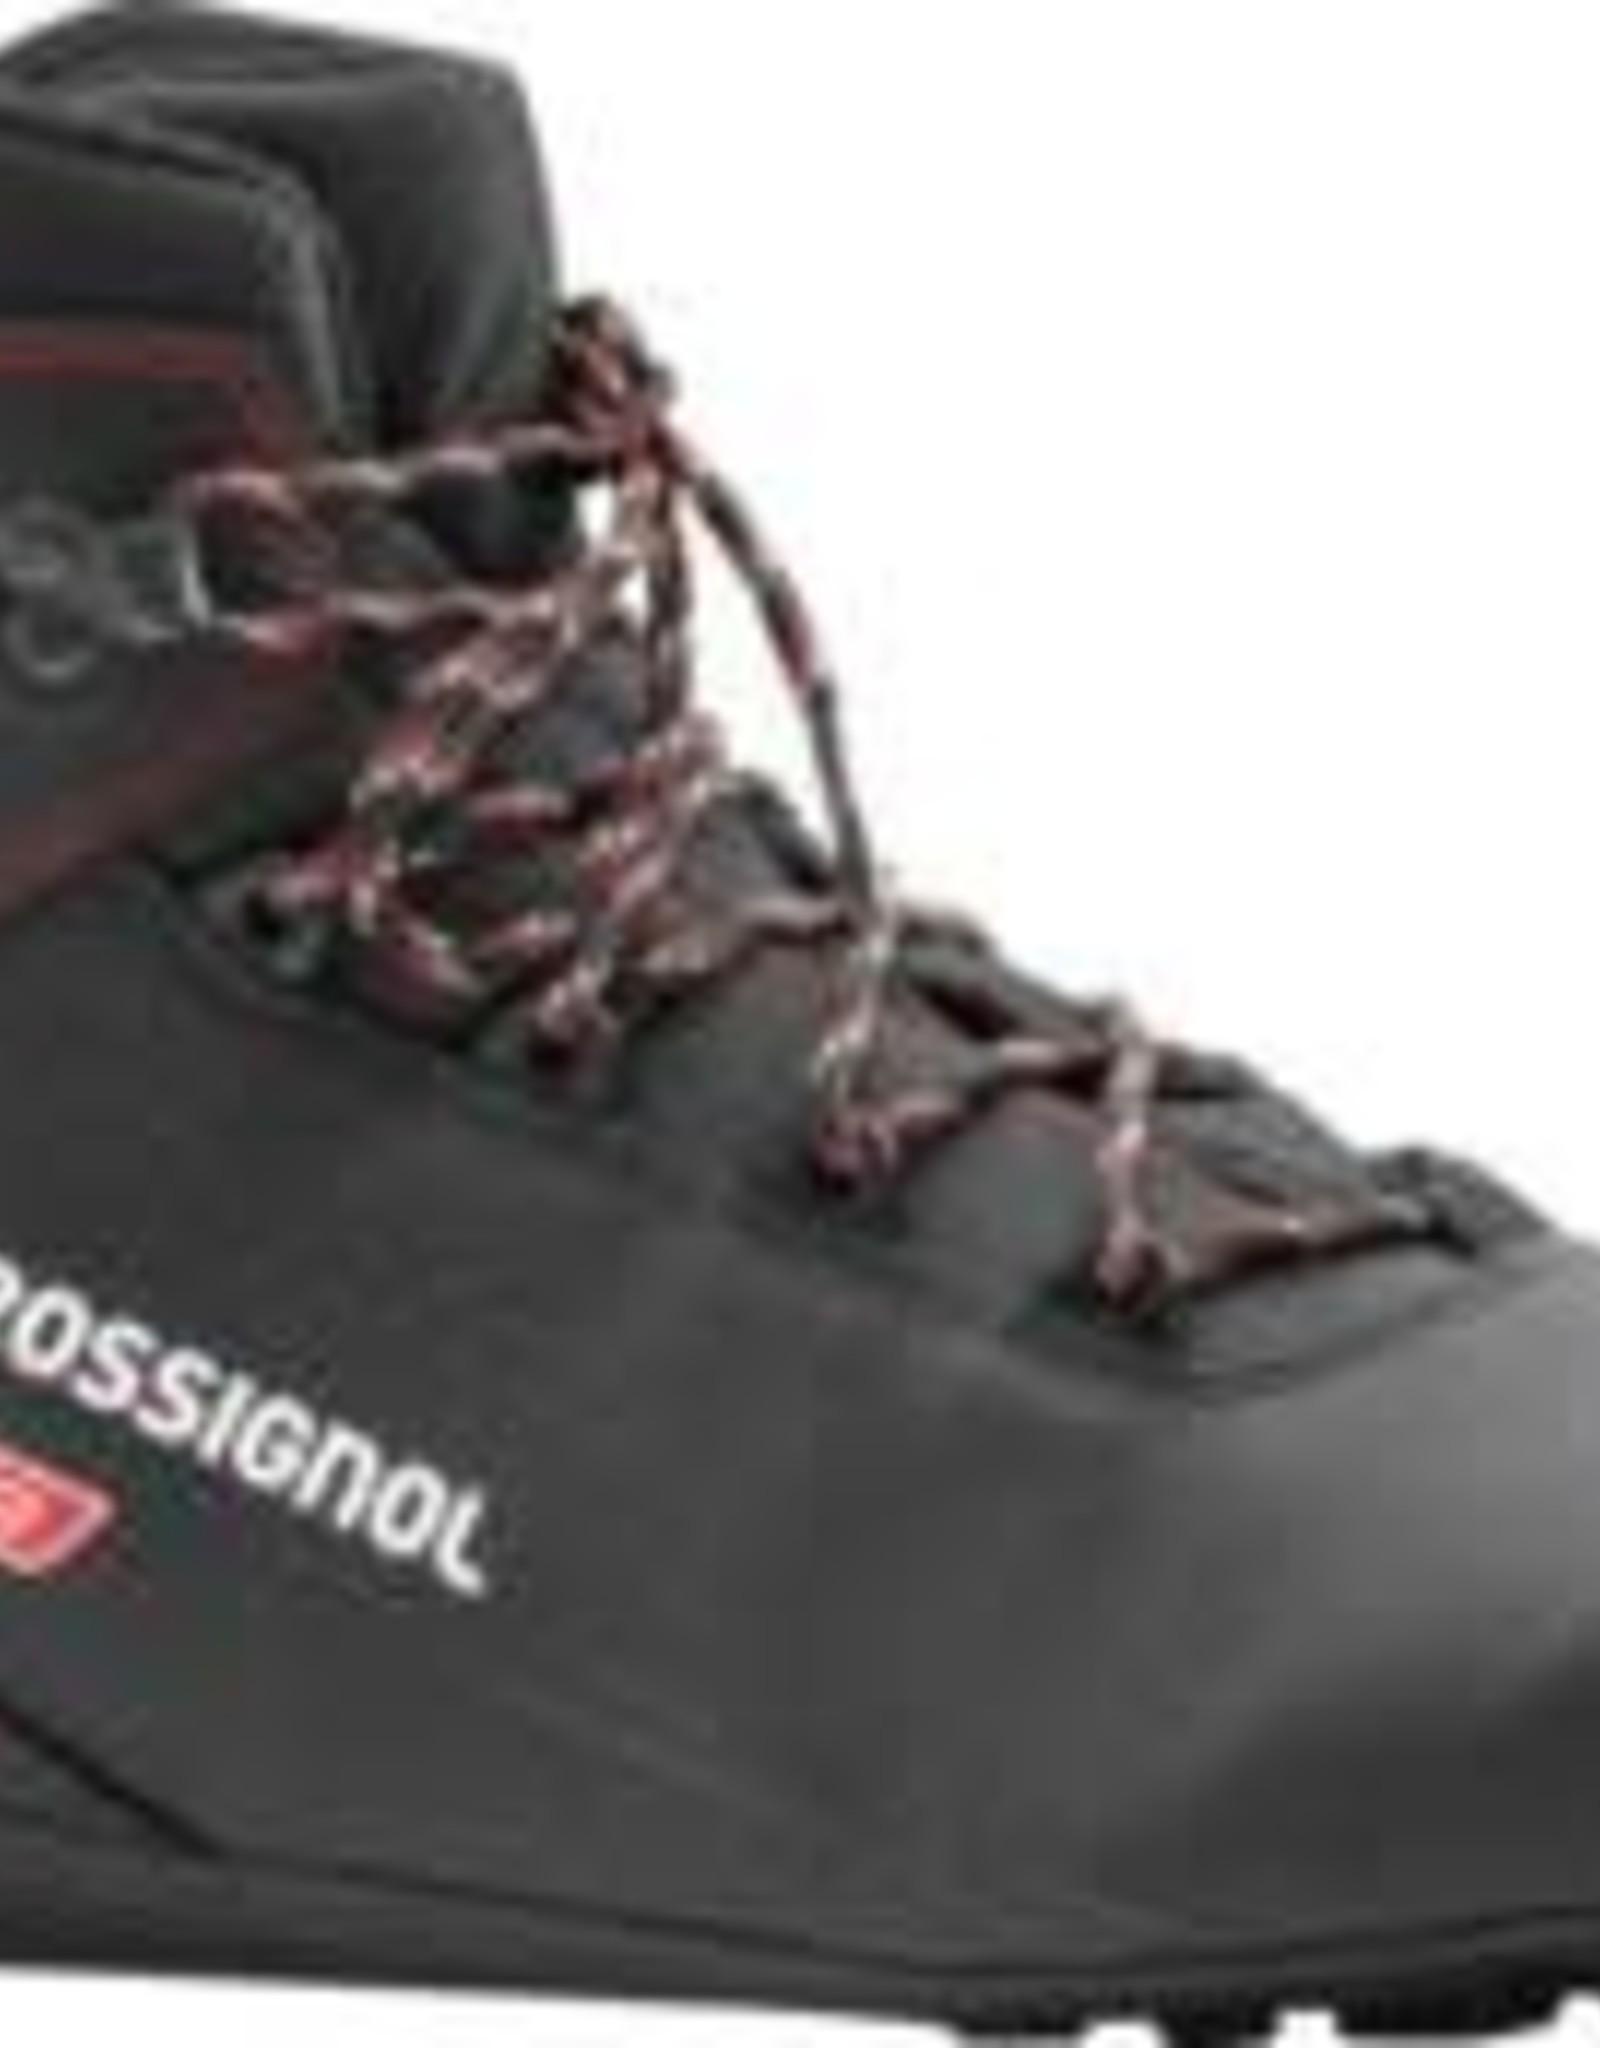 Rossignol ROSSIGNOL X-R - 490